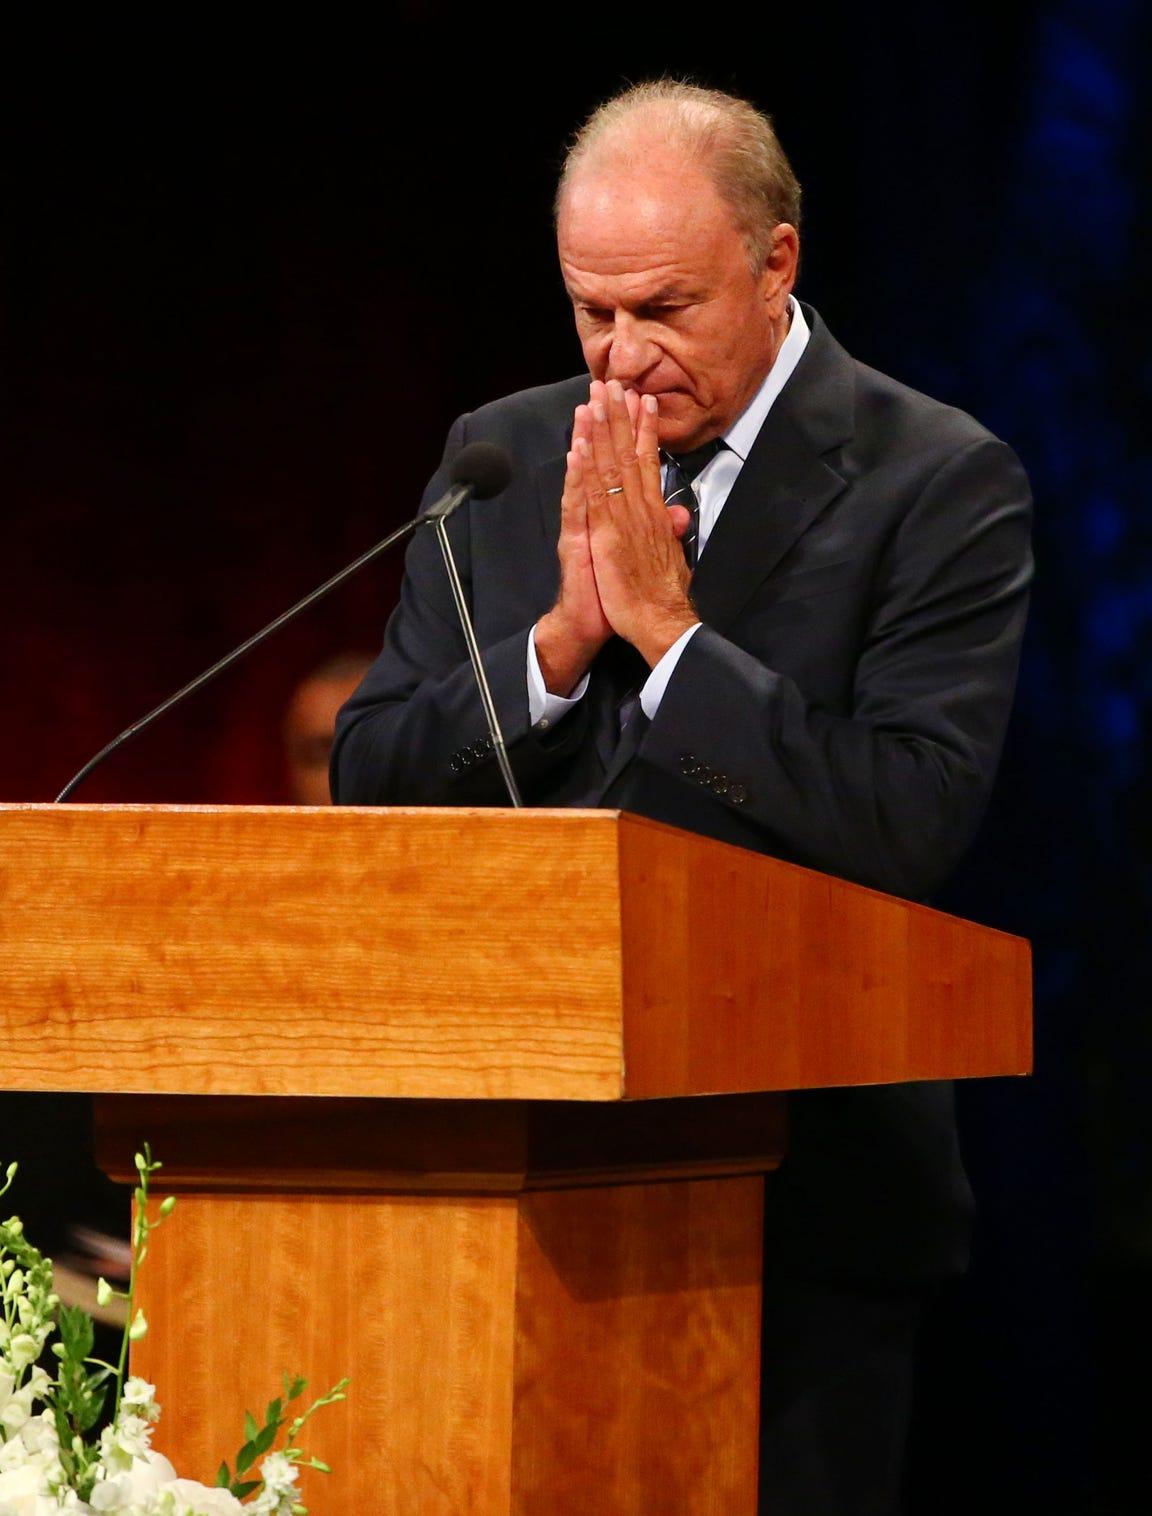 Grant Woods, former Arizona Attorney General, pays tribune to his friend U.S. Senator John McCain during a memorial service at North Phoenix Baptist Church on Aug. 30, 2018.